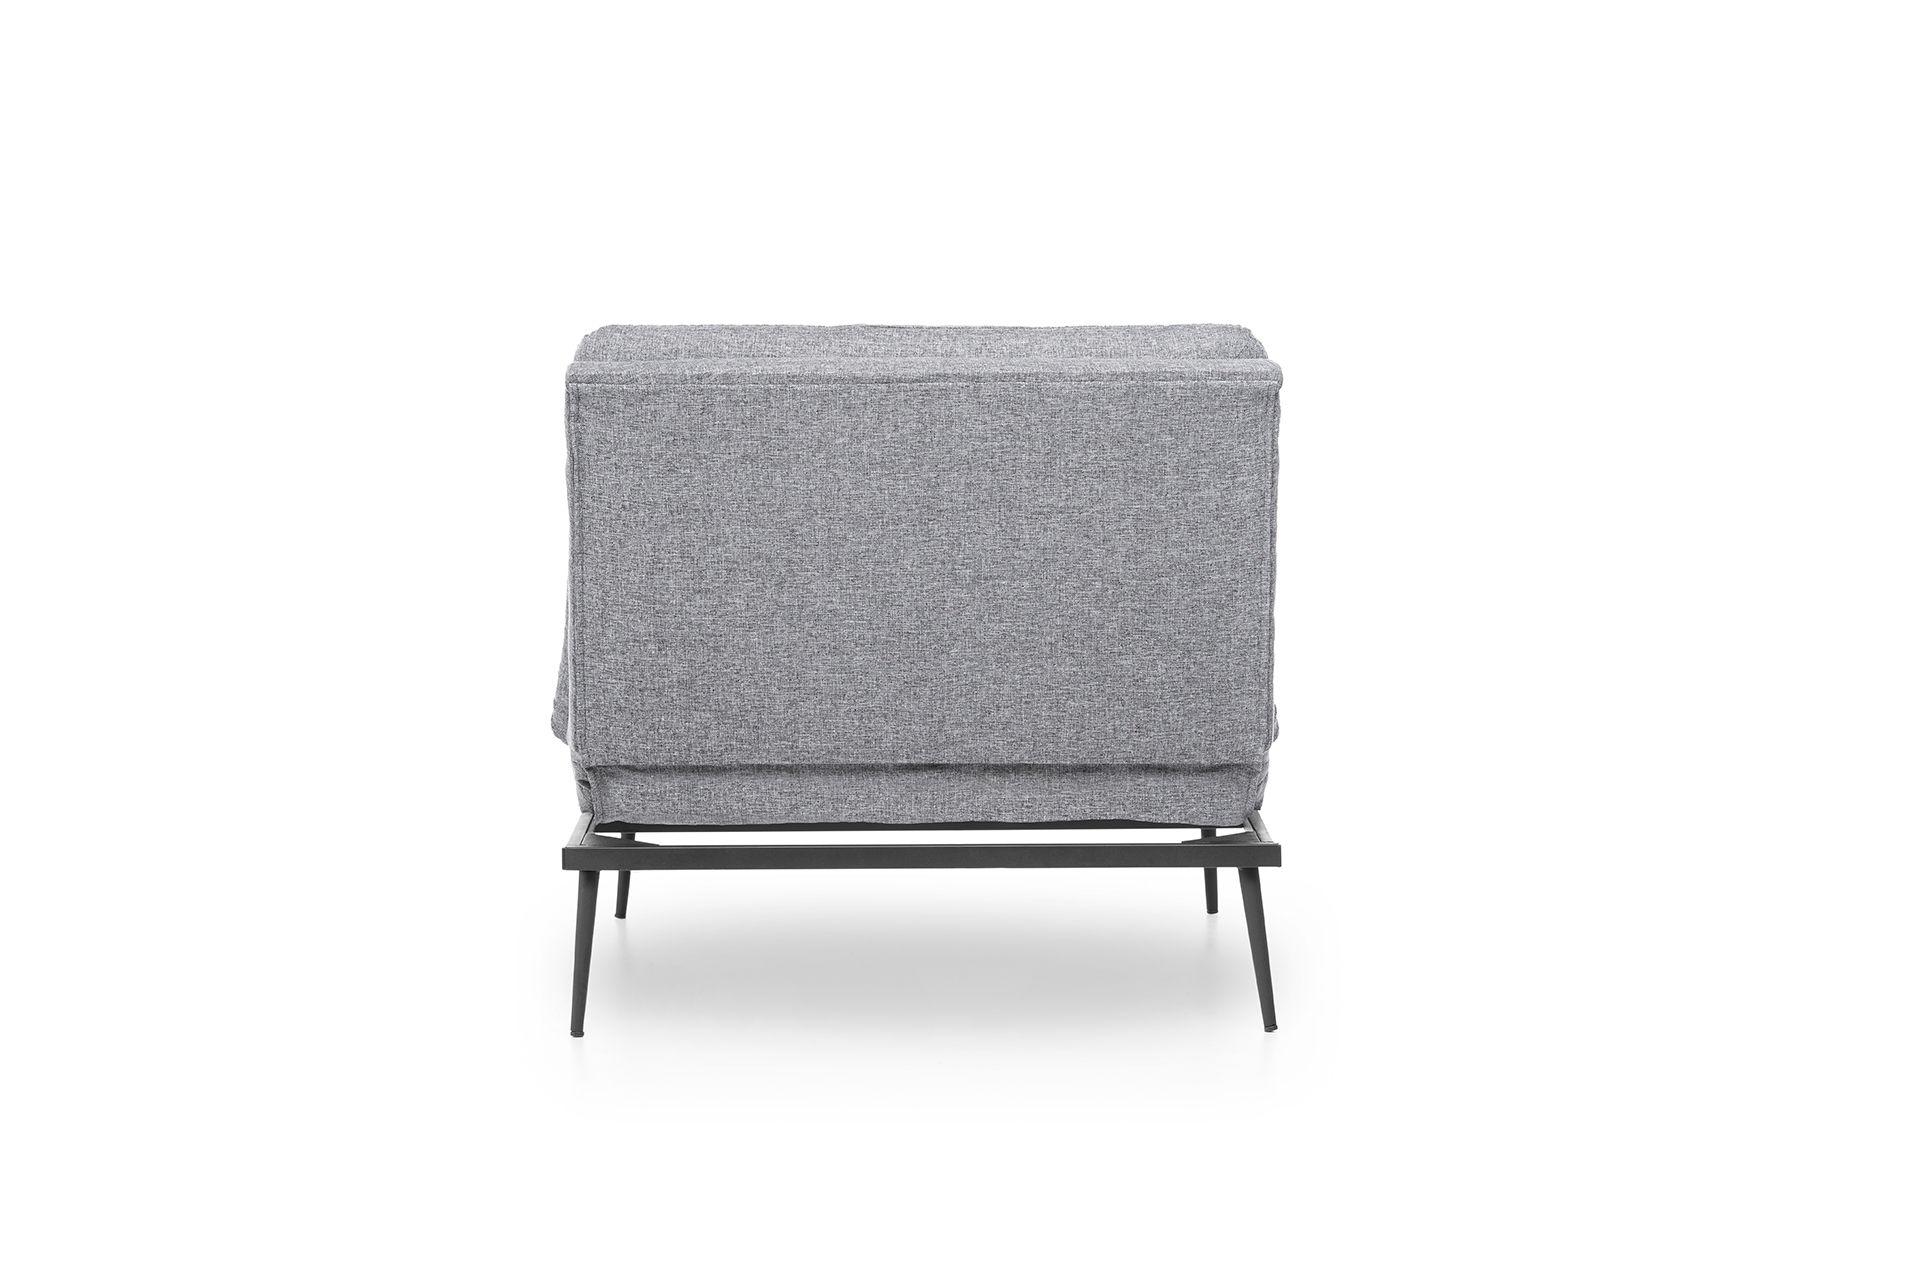 Futon Martin Chair Bed, Grey